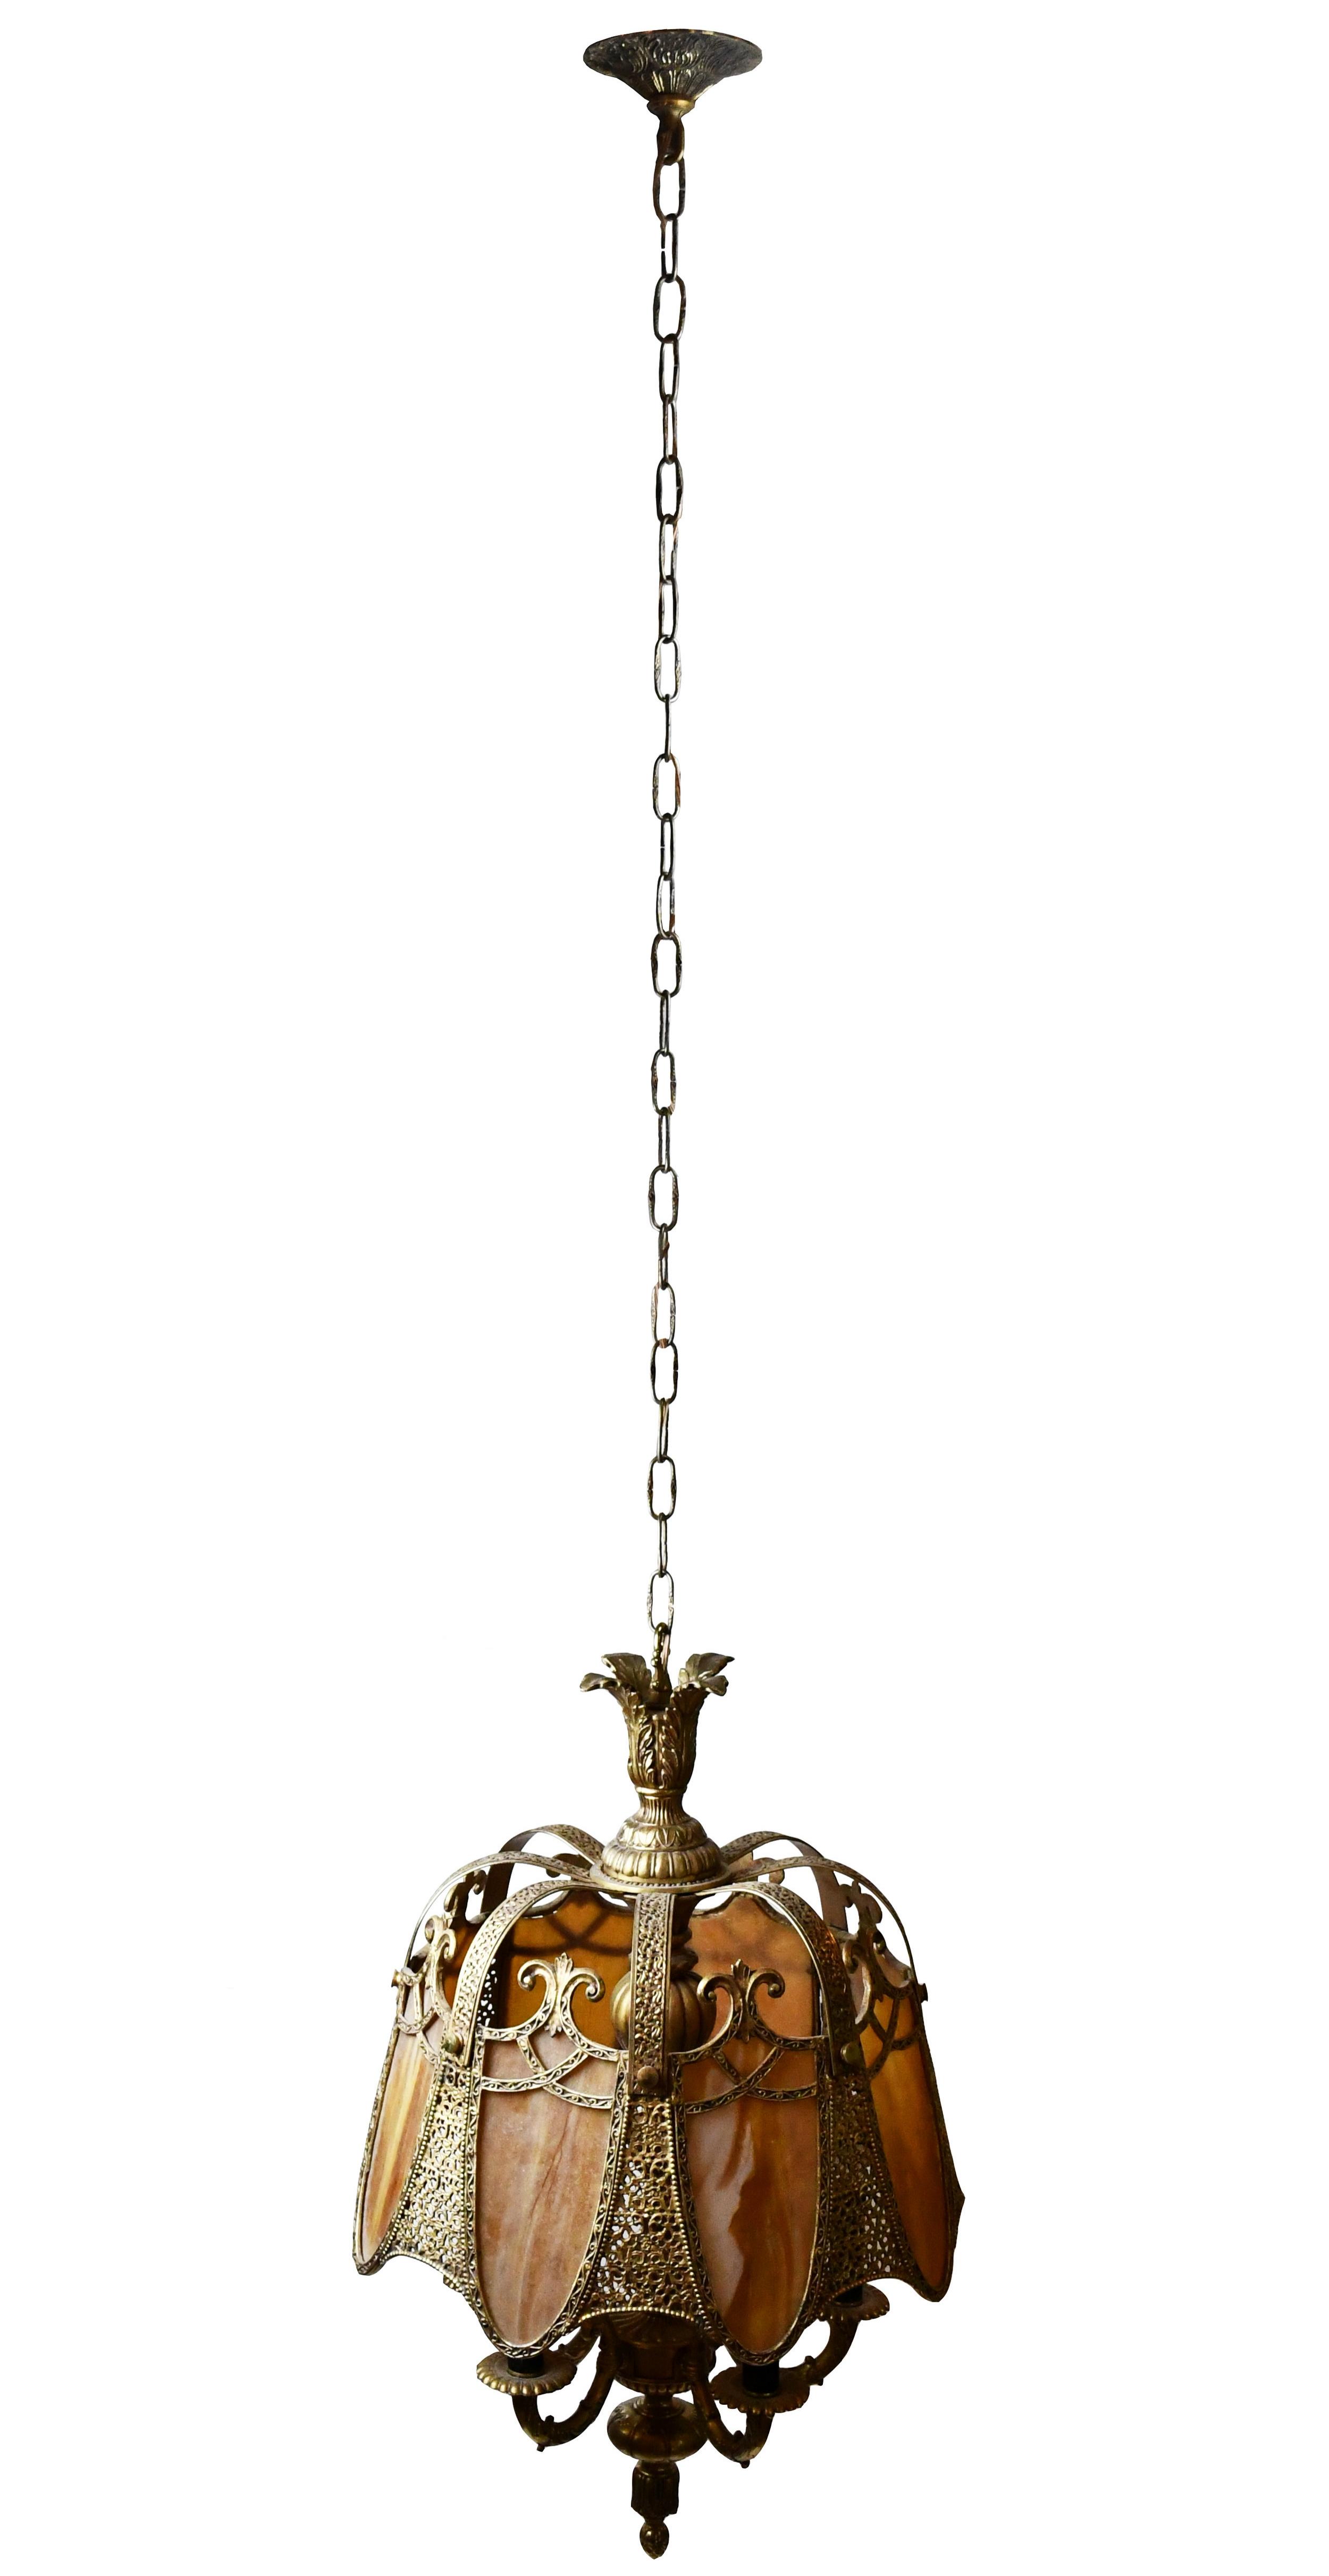 47331-brass-pendant-with-filagree-full.jpg